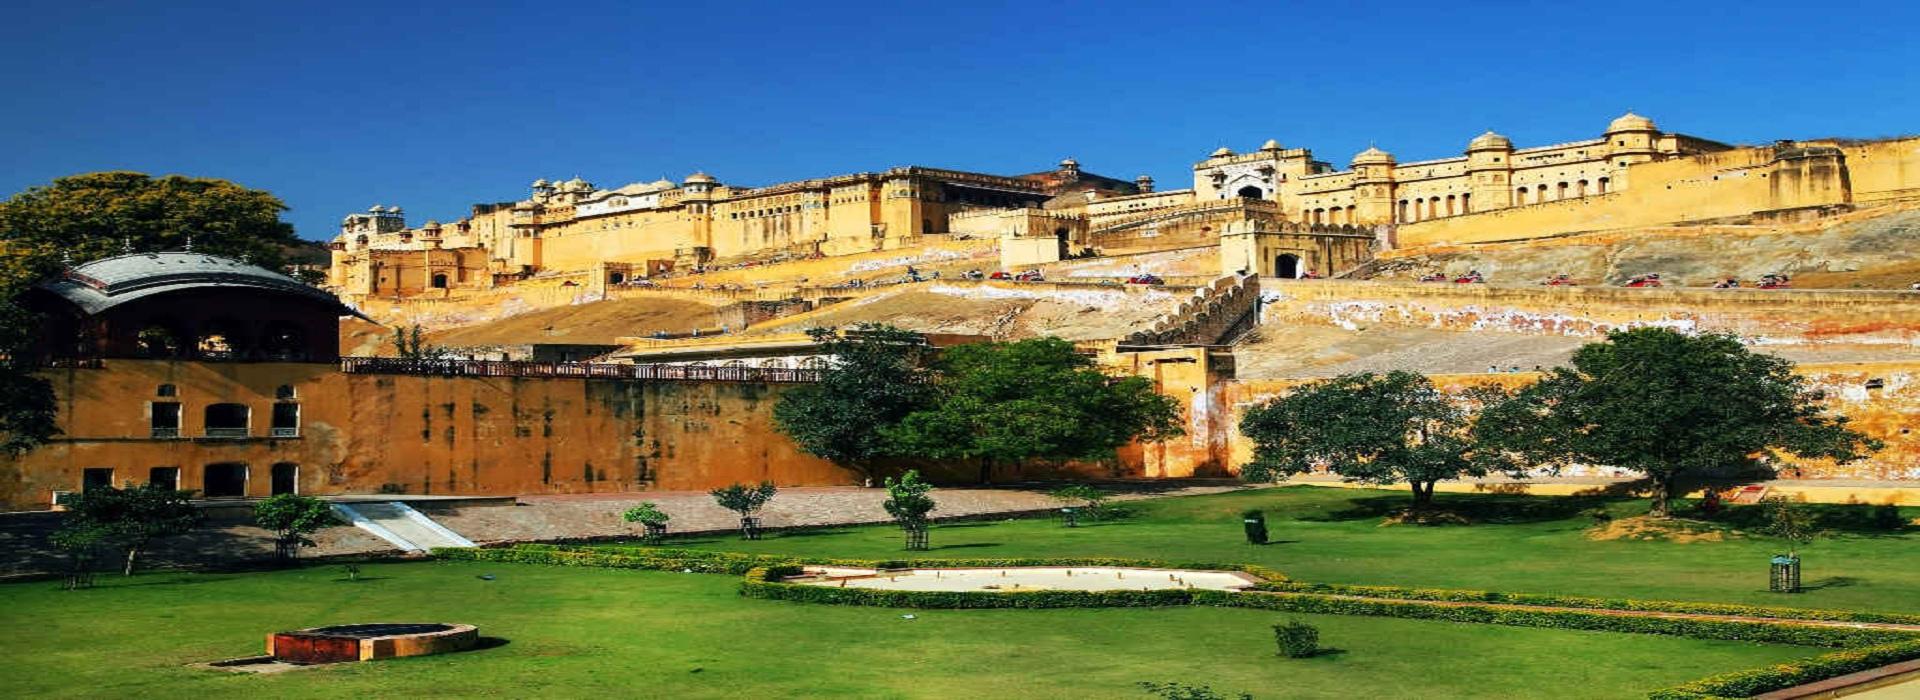 City Palace Jaipur History Timings & Facts